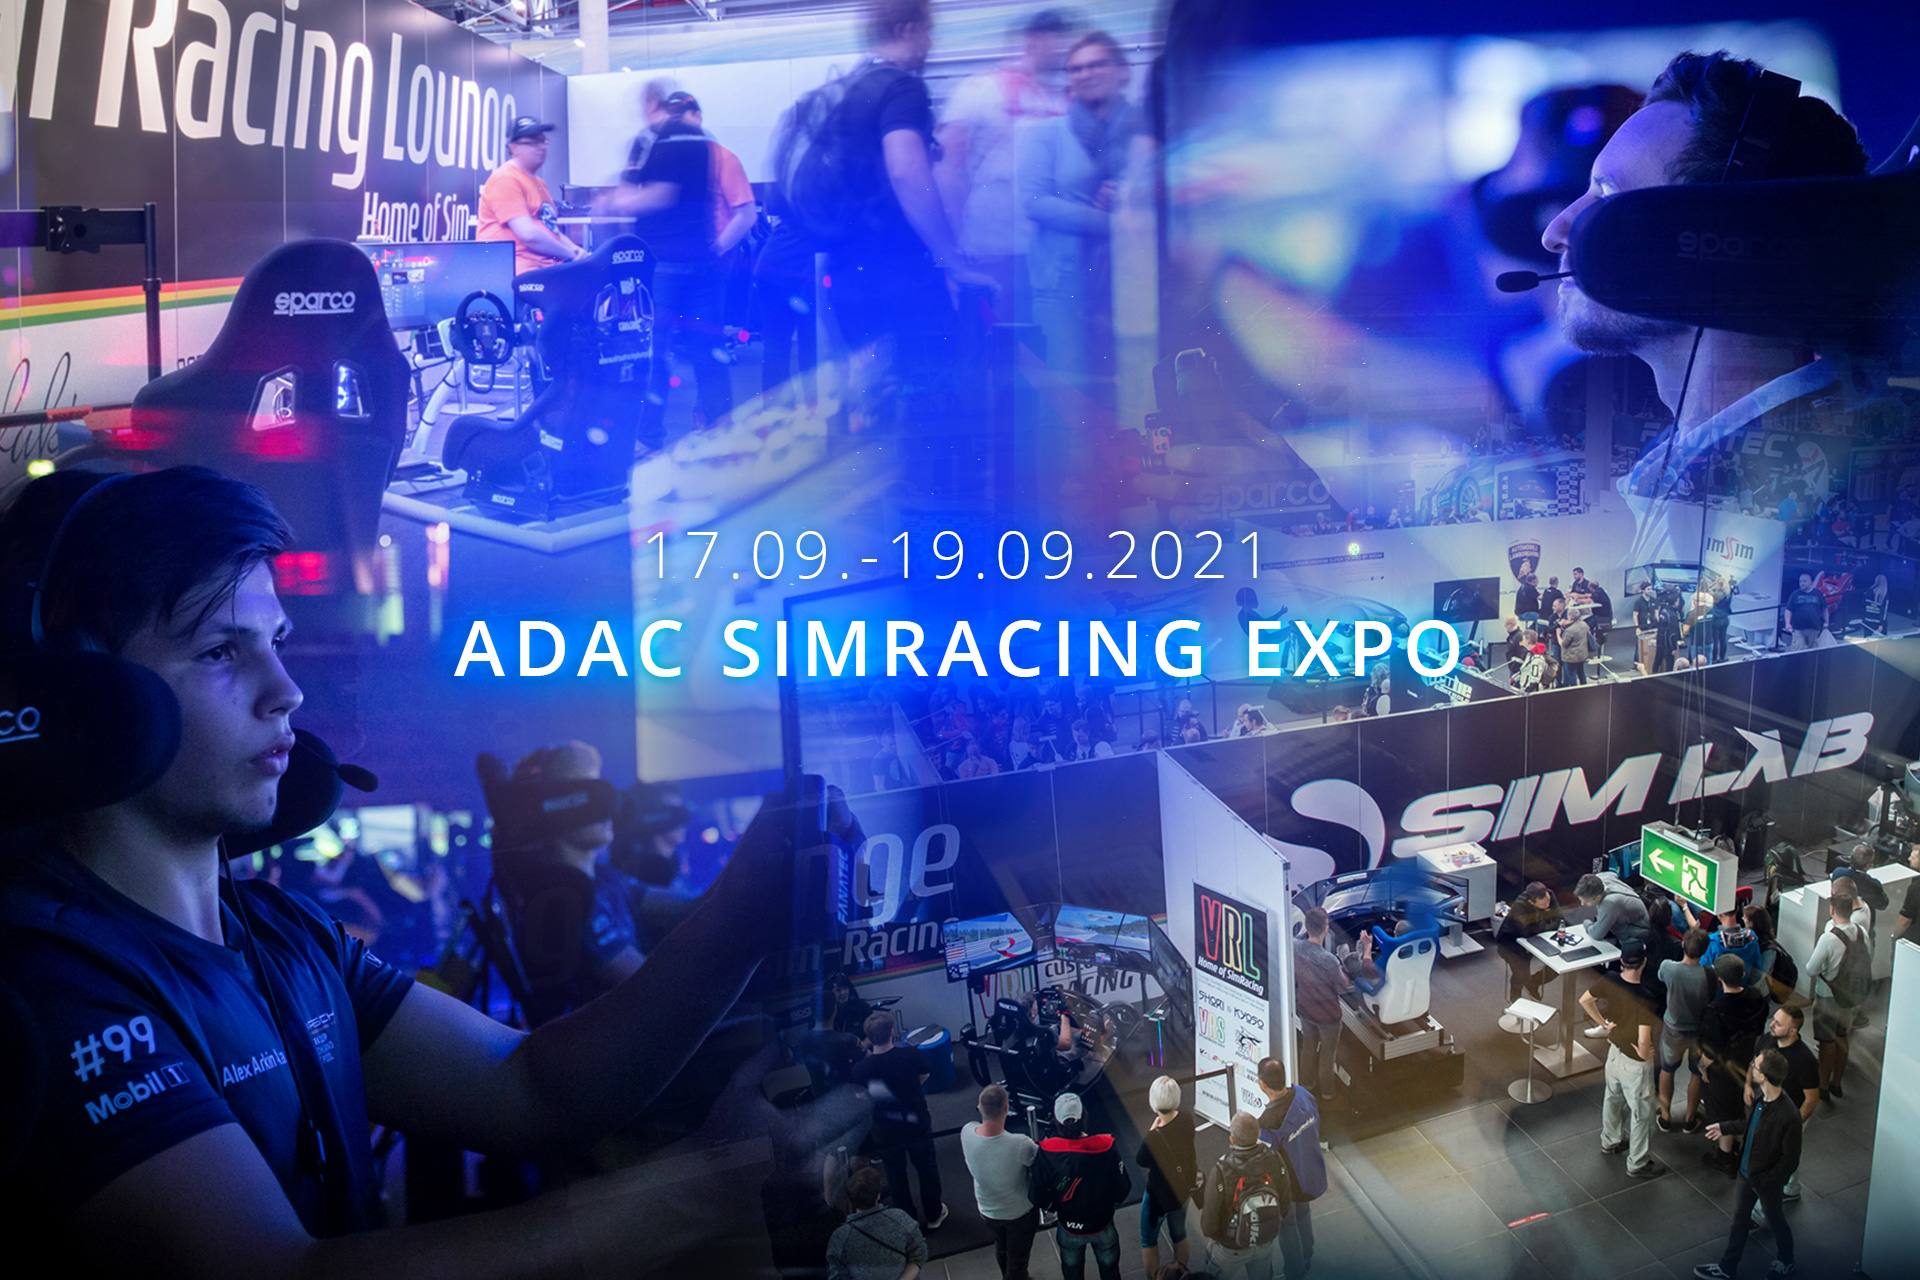 ADAC SimRacing Expo kehrt zurück zum Nürburgring